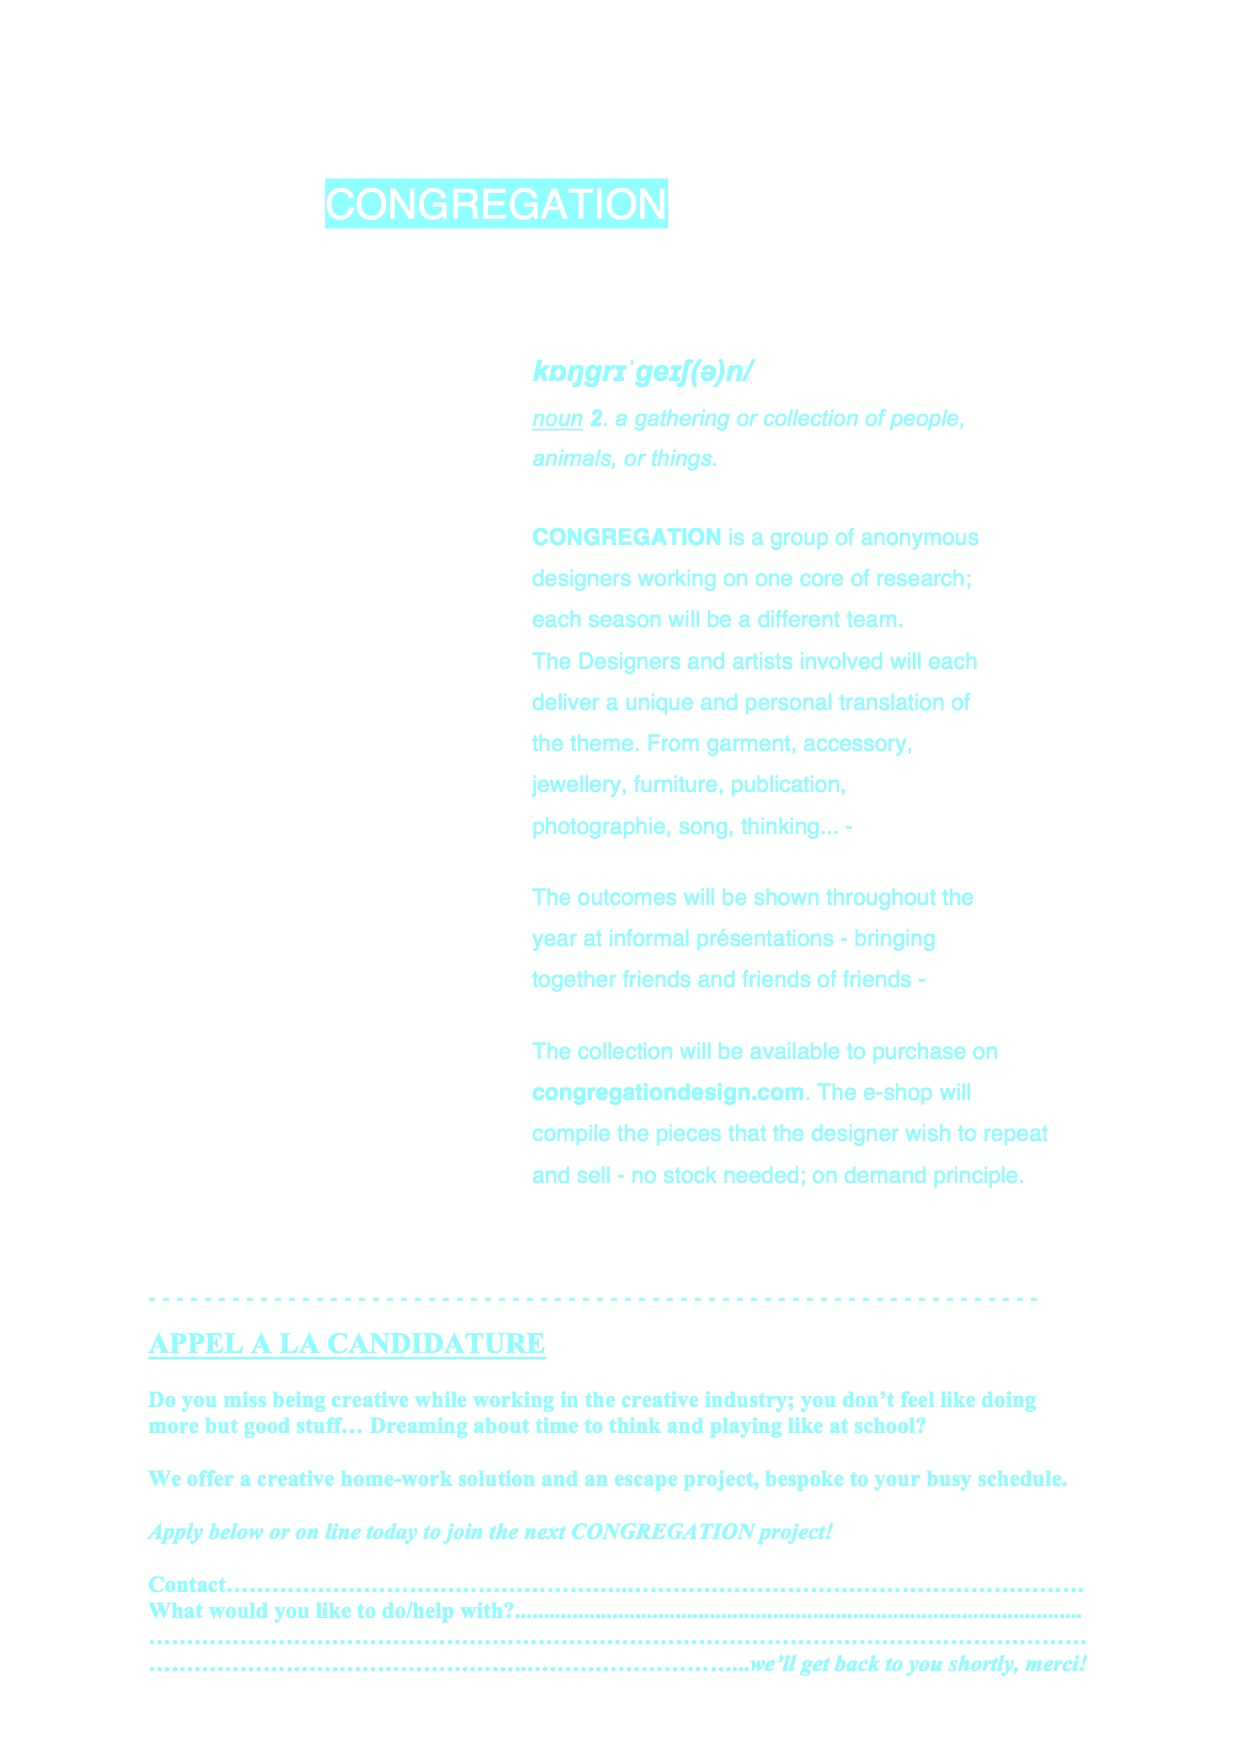 CONGREGATIONdesign_press_release_presentation1_www.memogallery.co.uk.jpg